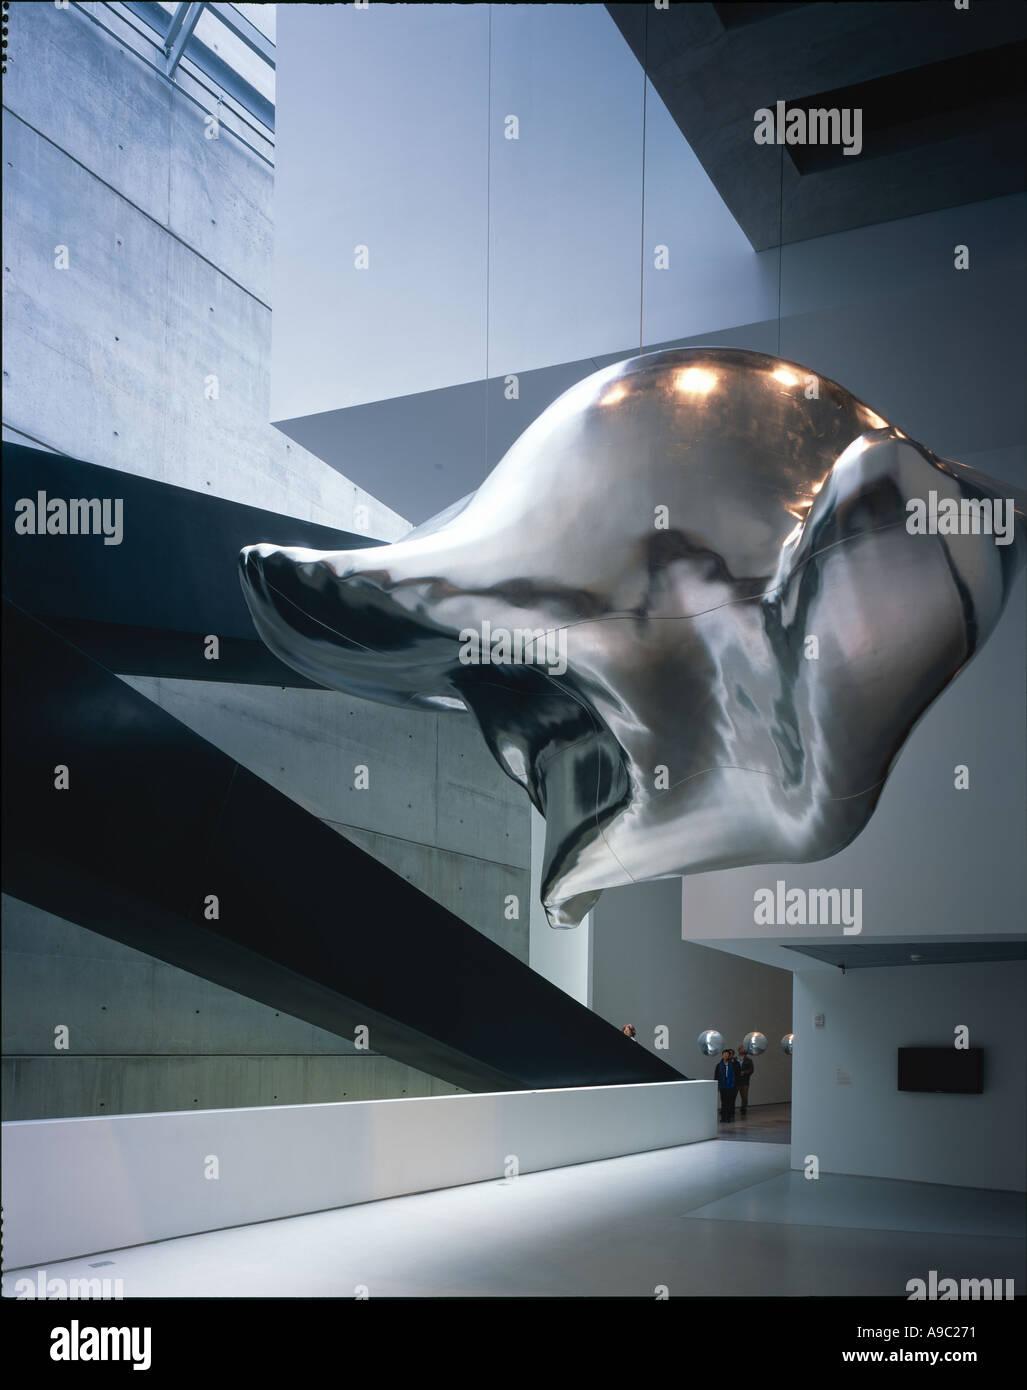 Cincinnati Contemporary Arts Center, Ohio, USA. - Interior. CONTAINS COPYRIGHT ARTWORKS. Architect: Zaha Hadid Stock Photo